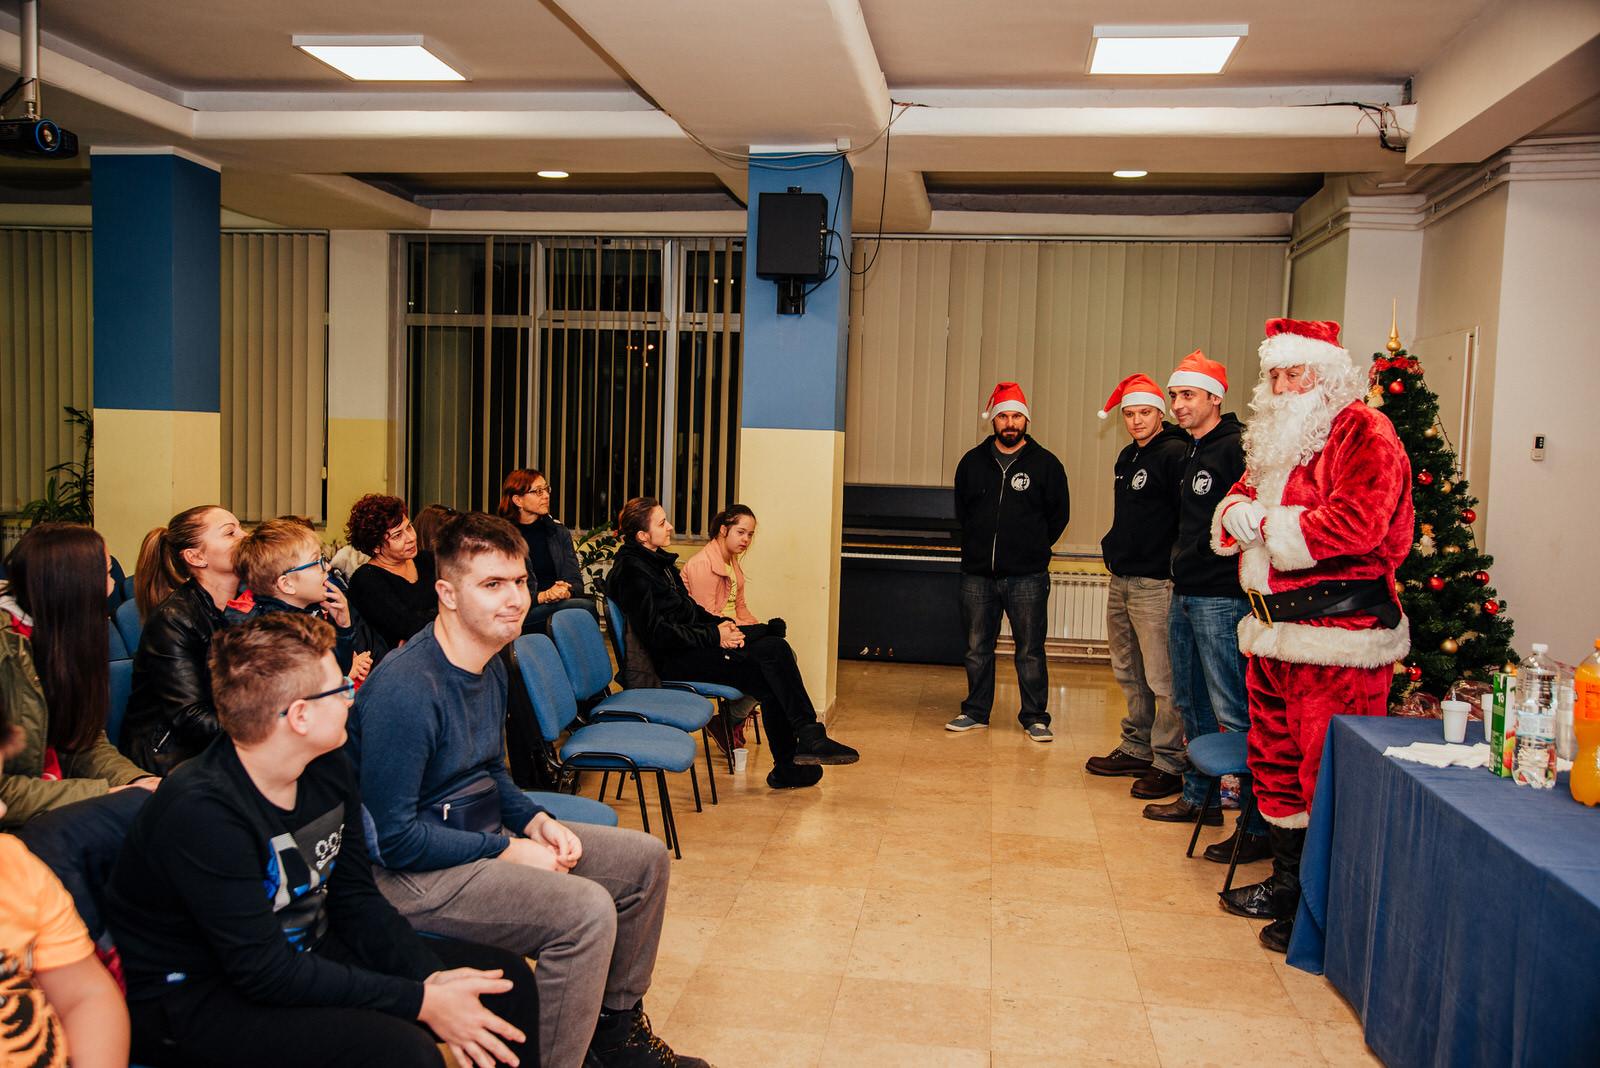 likaclub_airsoft-team-gospić-i-udruga-pčelice_2019-12